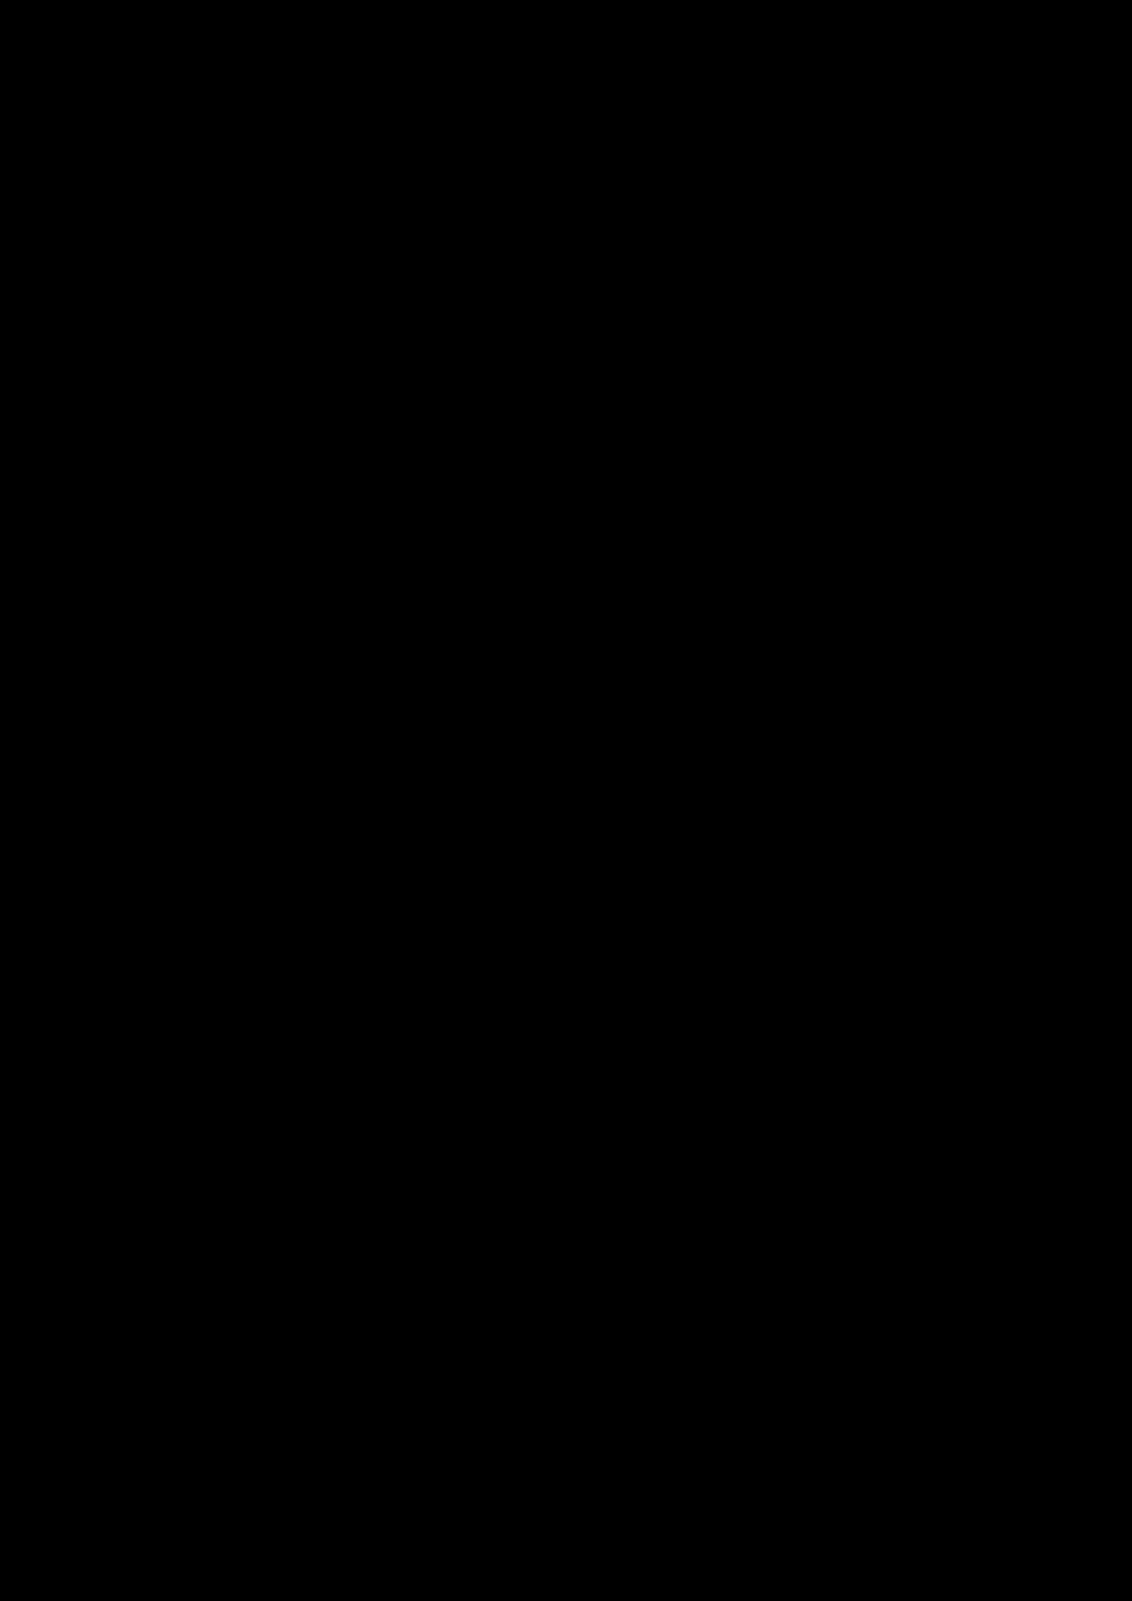 Ten lyubvi slide, Image 9